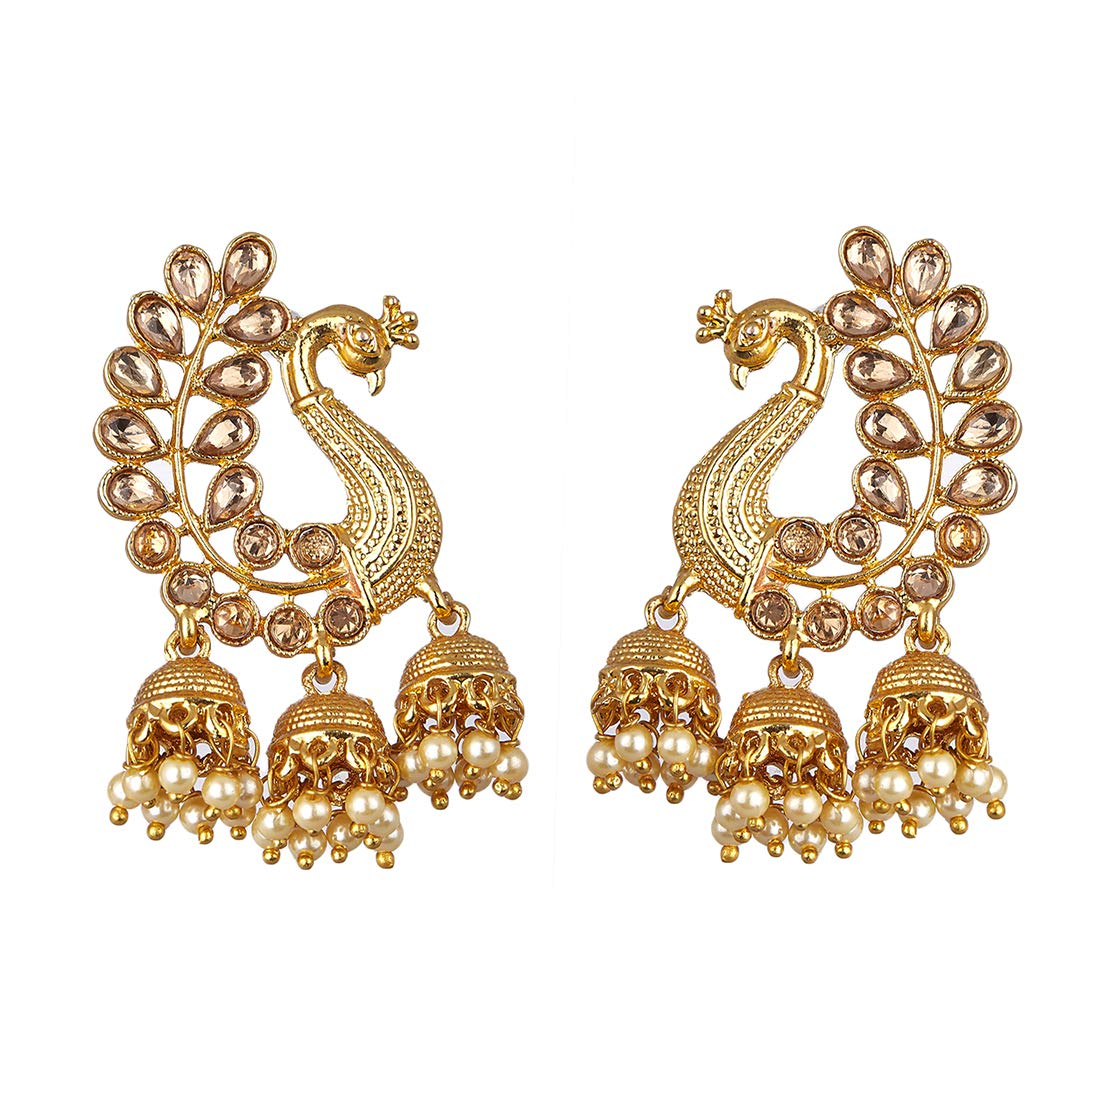 Zeneme Earrings for women stylish Jewellery Traditional